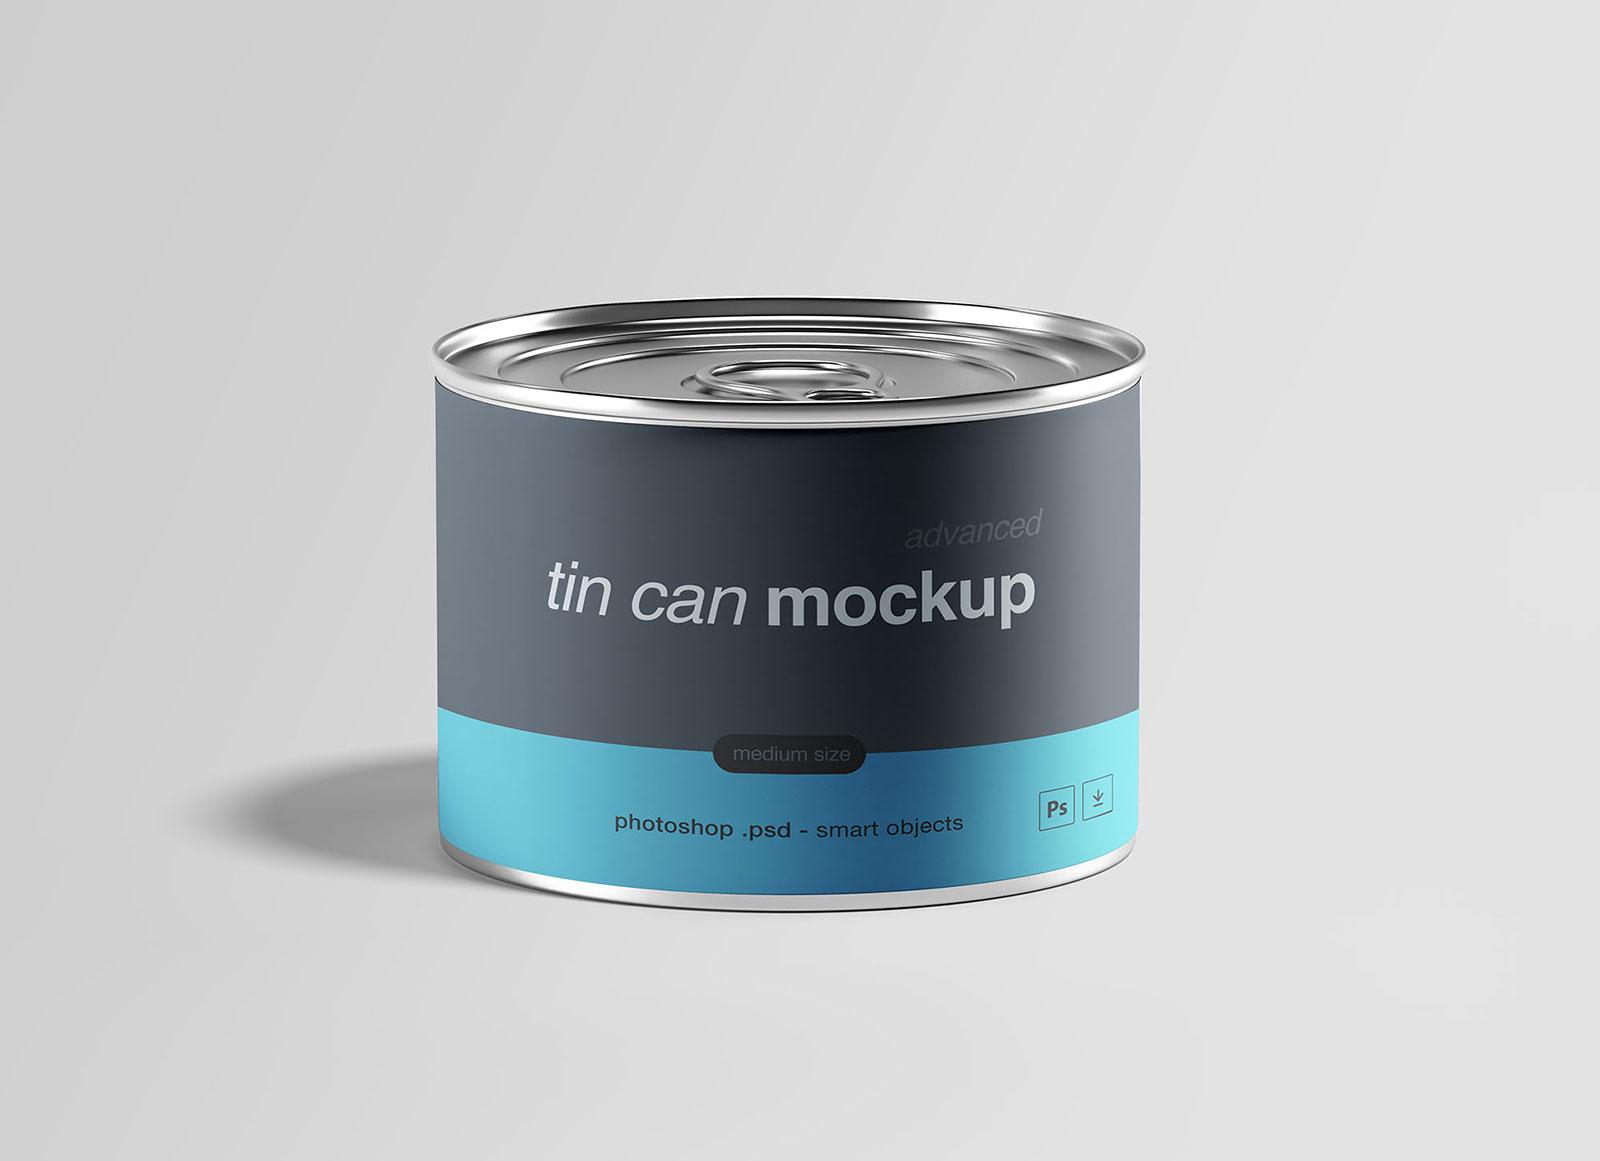 Free-medium-Size-Food-Tin-Can-Mockup-PSD-2